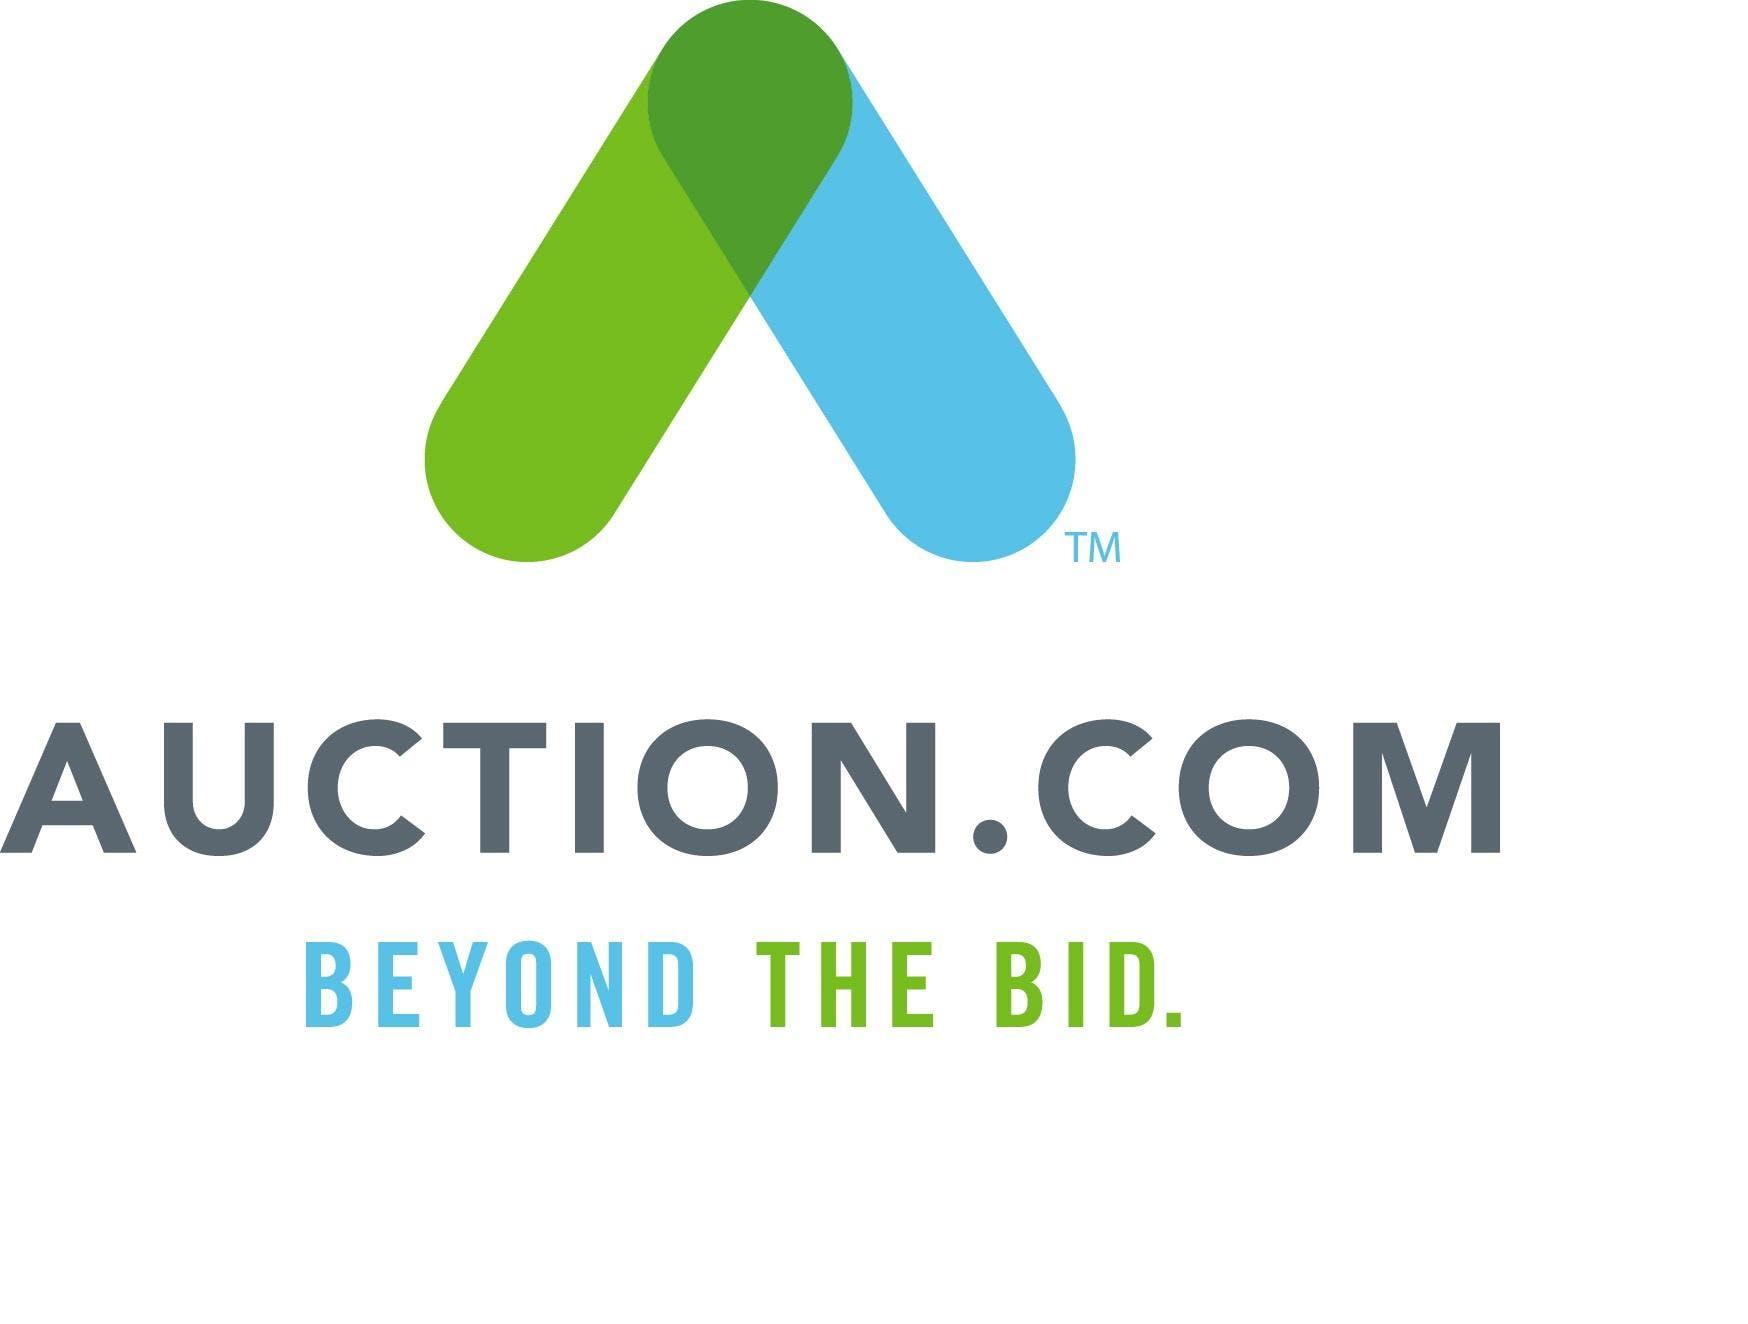 Auction.com Investor Workshop with Scott Bashaar in Tempe